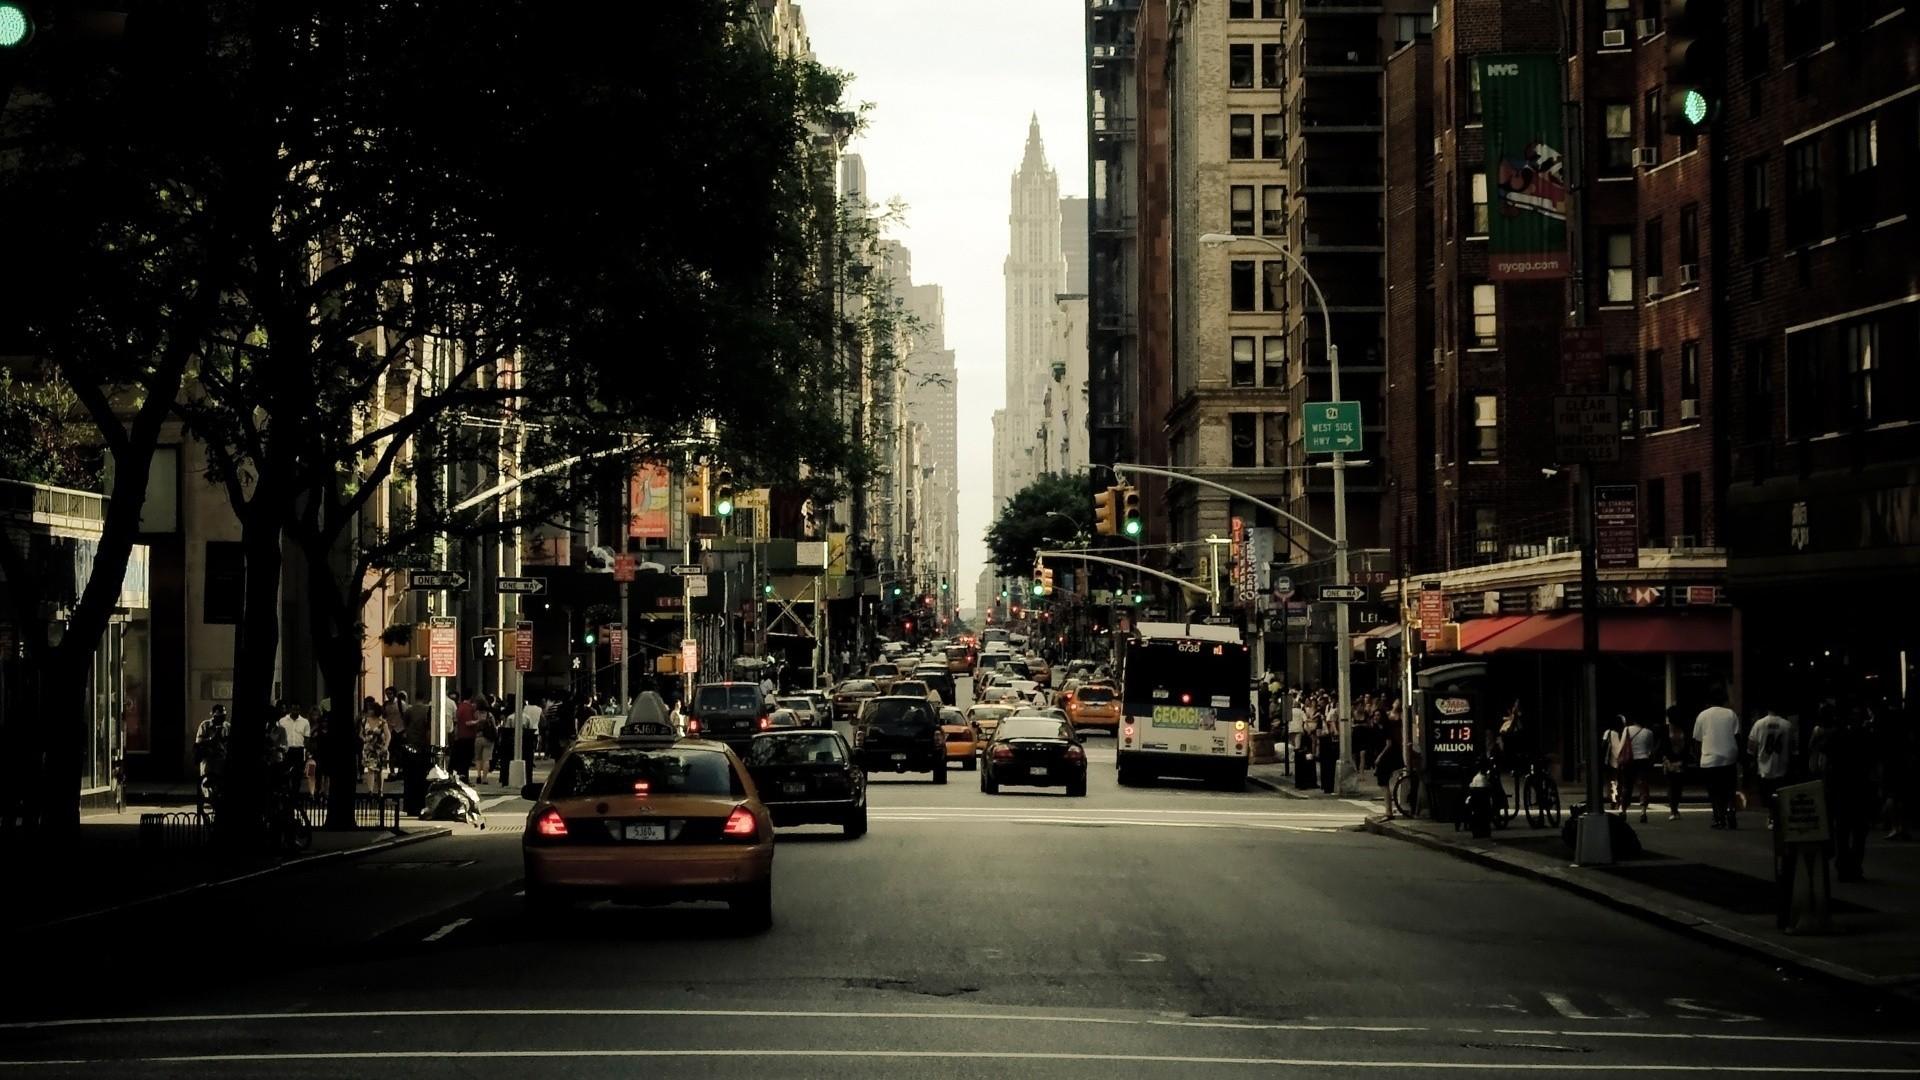 Great Wallpaper Macbook City - New-York-Wallpaper-13-1920x1080  Snapshot_798710.jpg